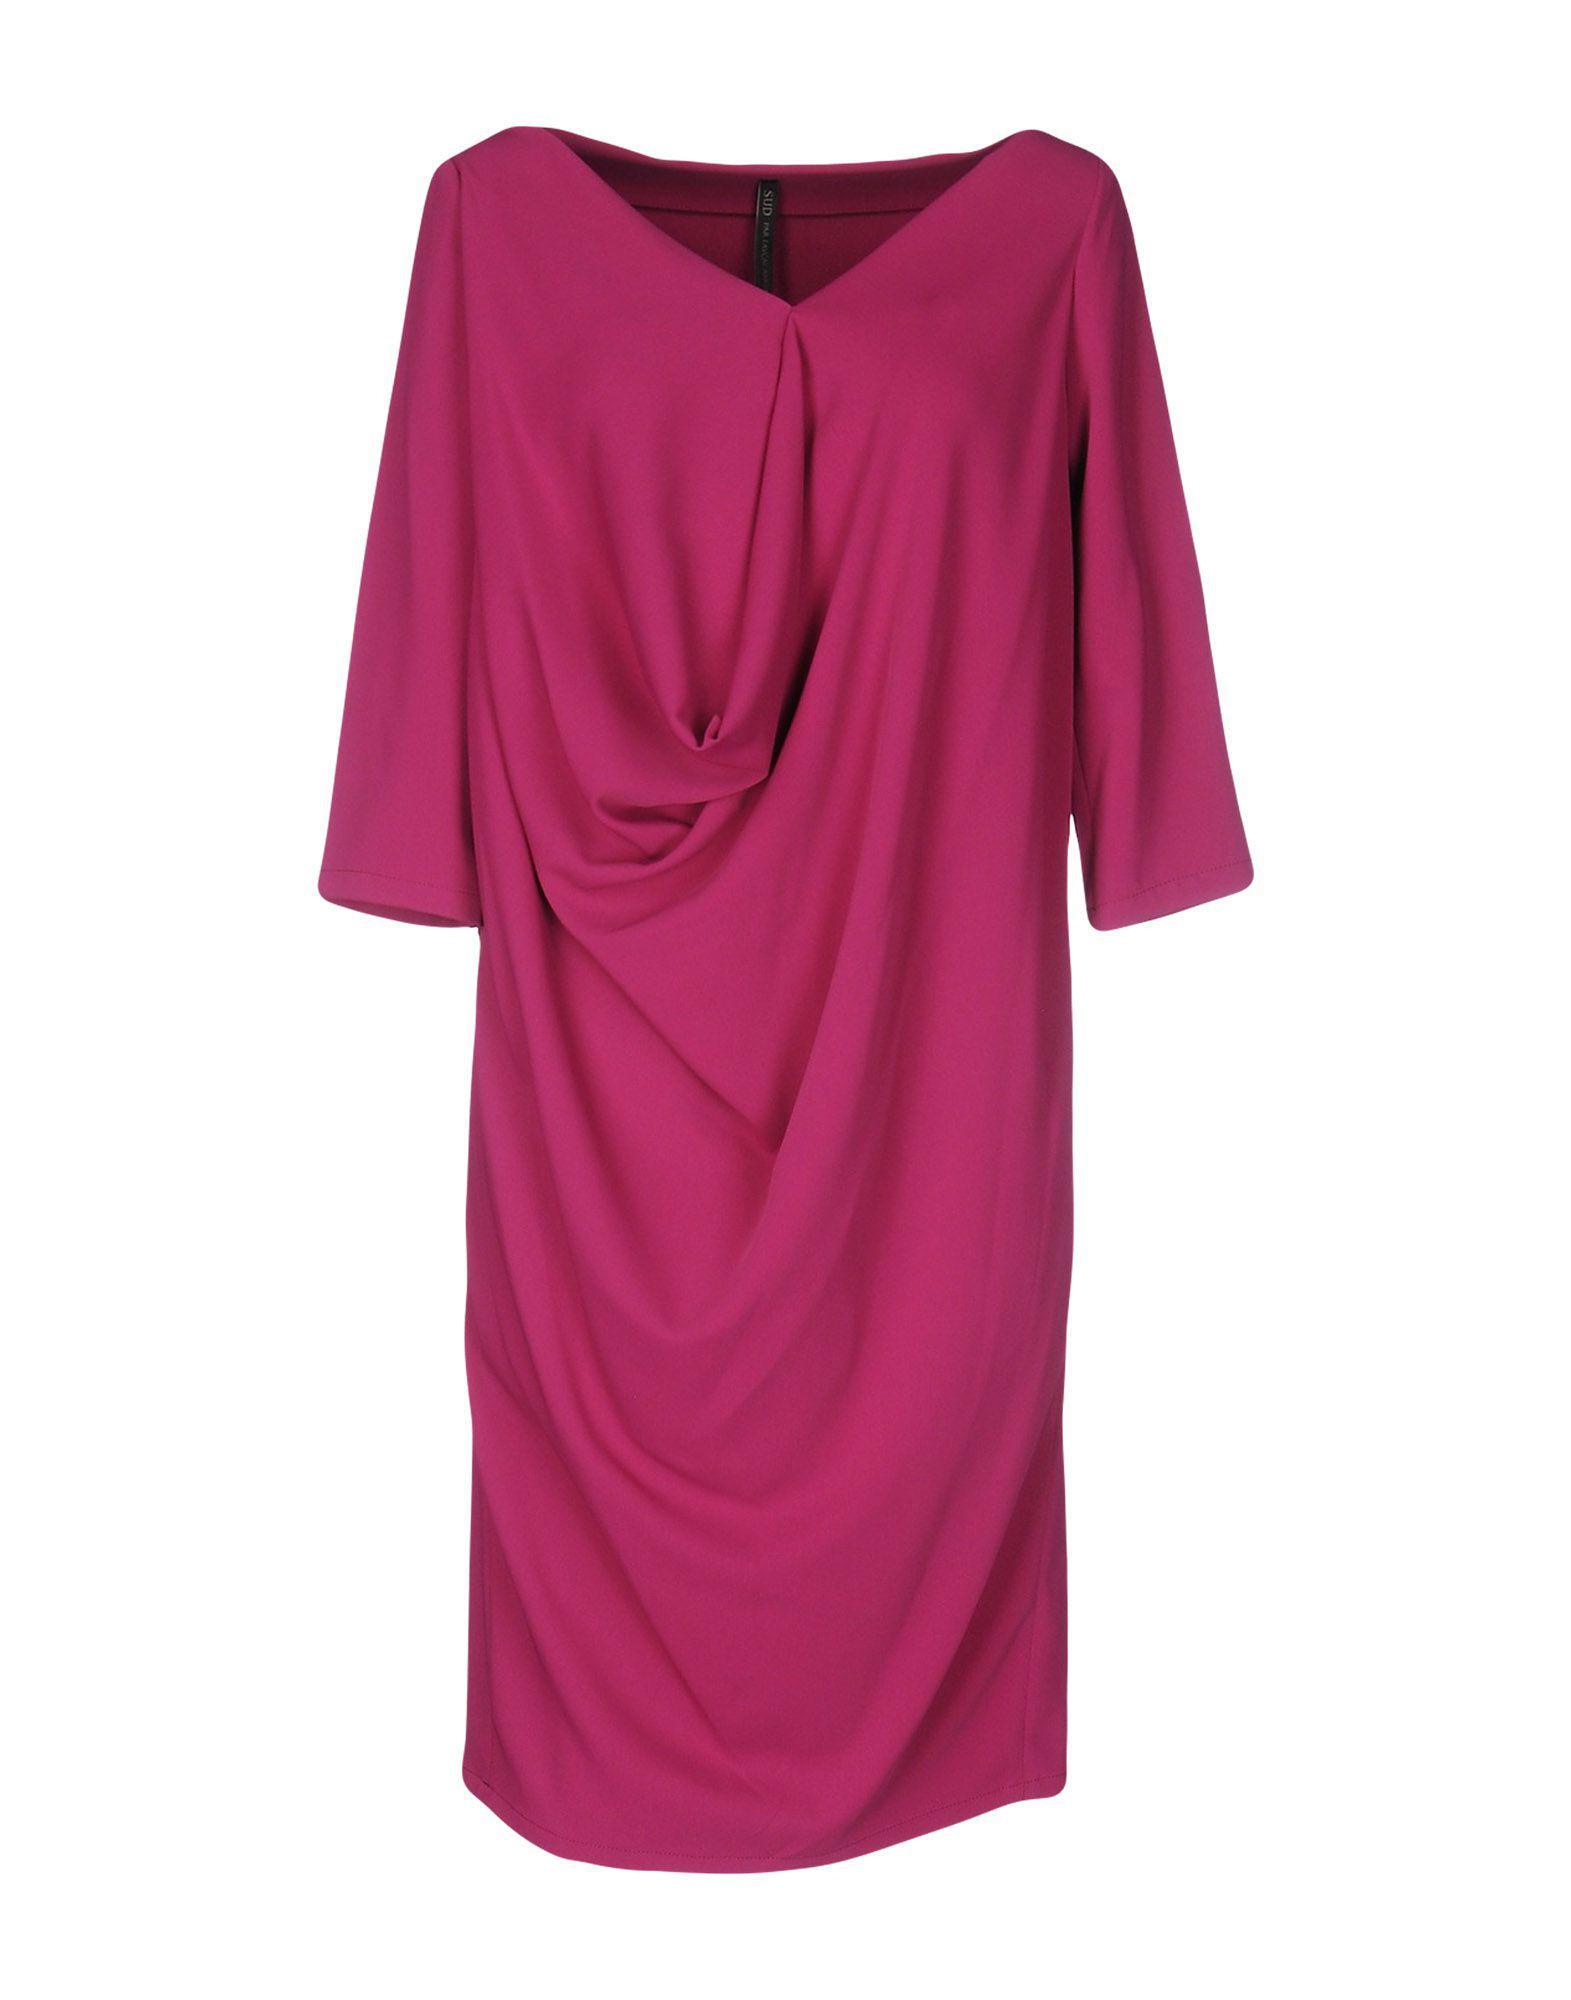 tiered v-neck dress - Pink & Purple Plein Sud qG0wY